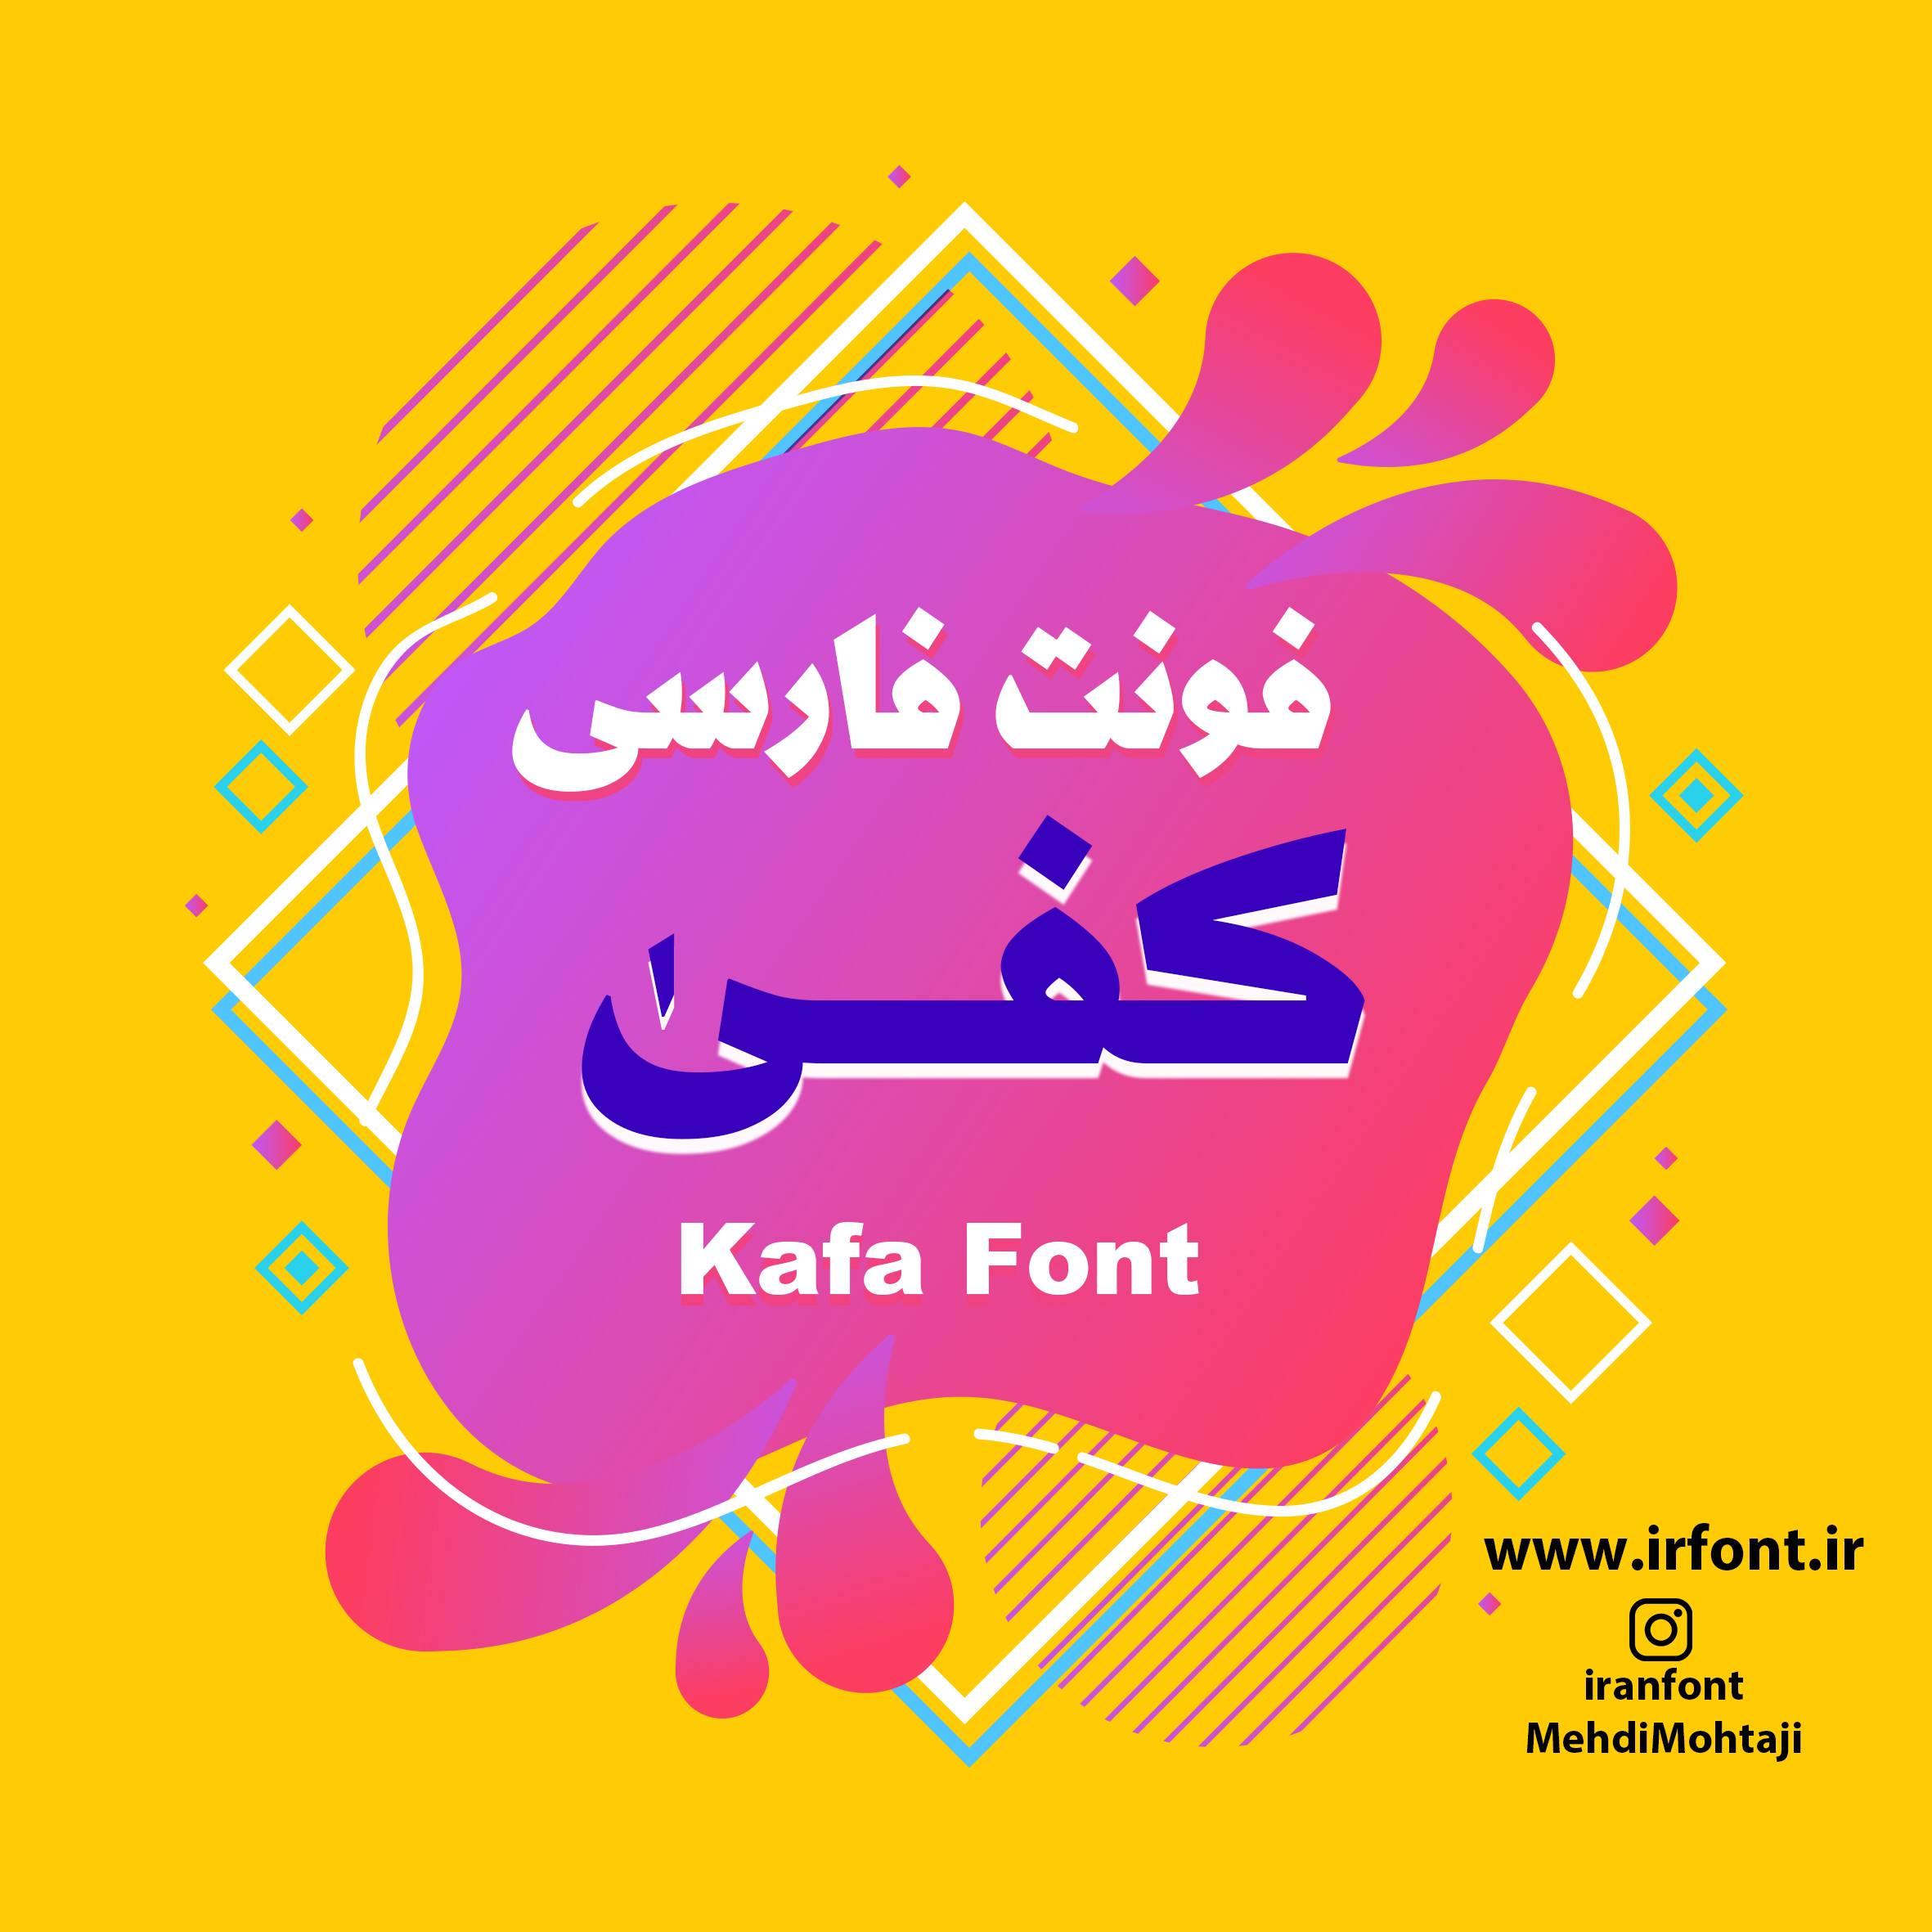 نسخه فارسی فونت کفا | Kafa Persian Typeface